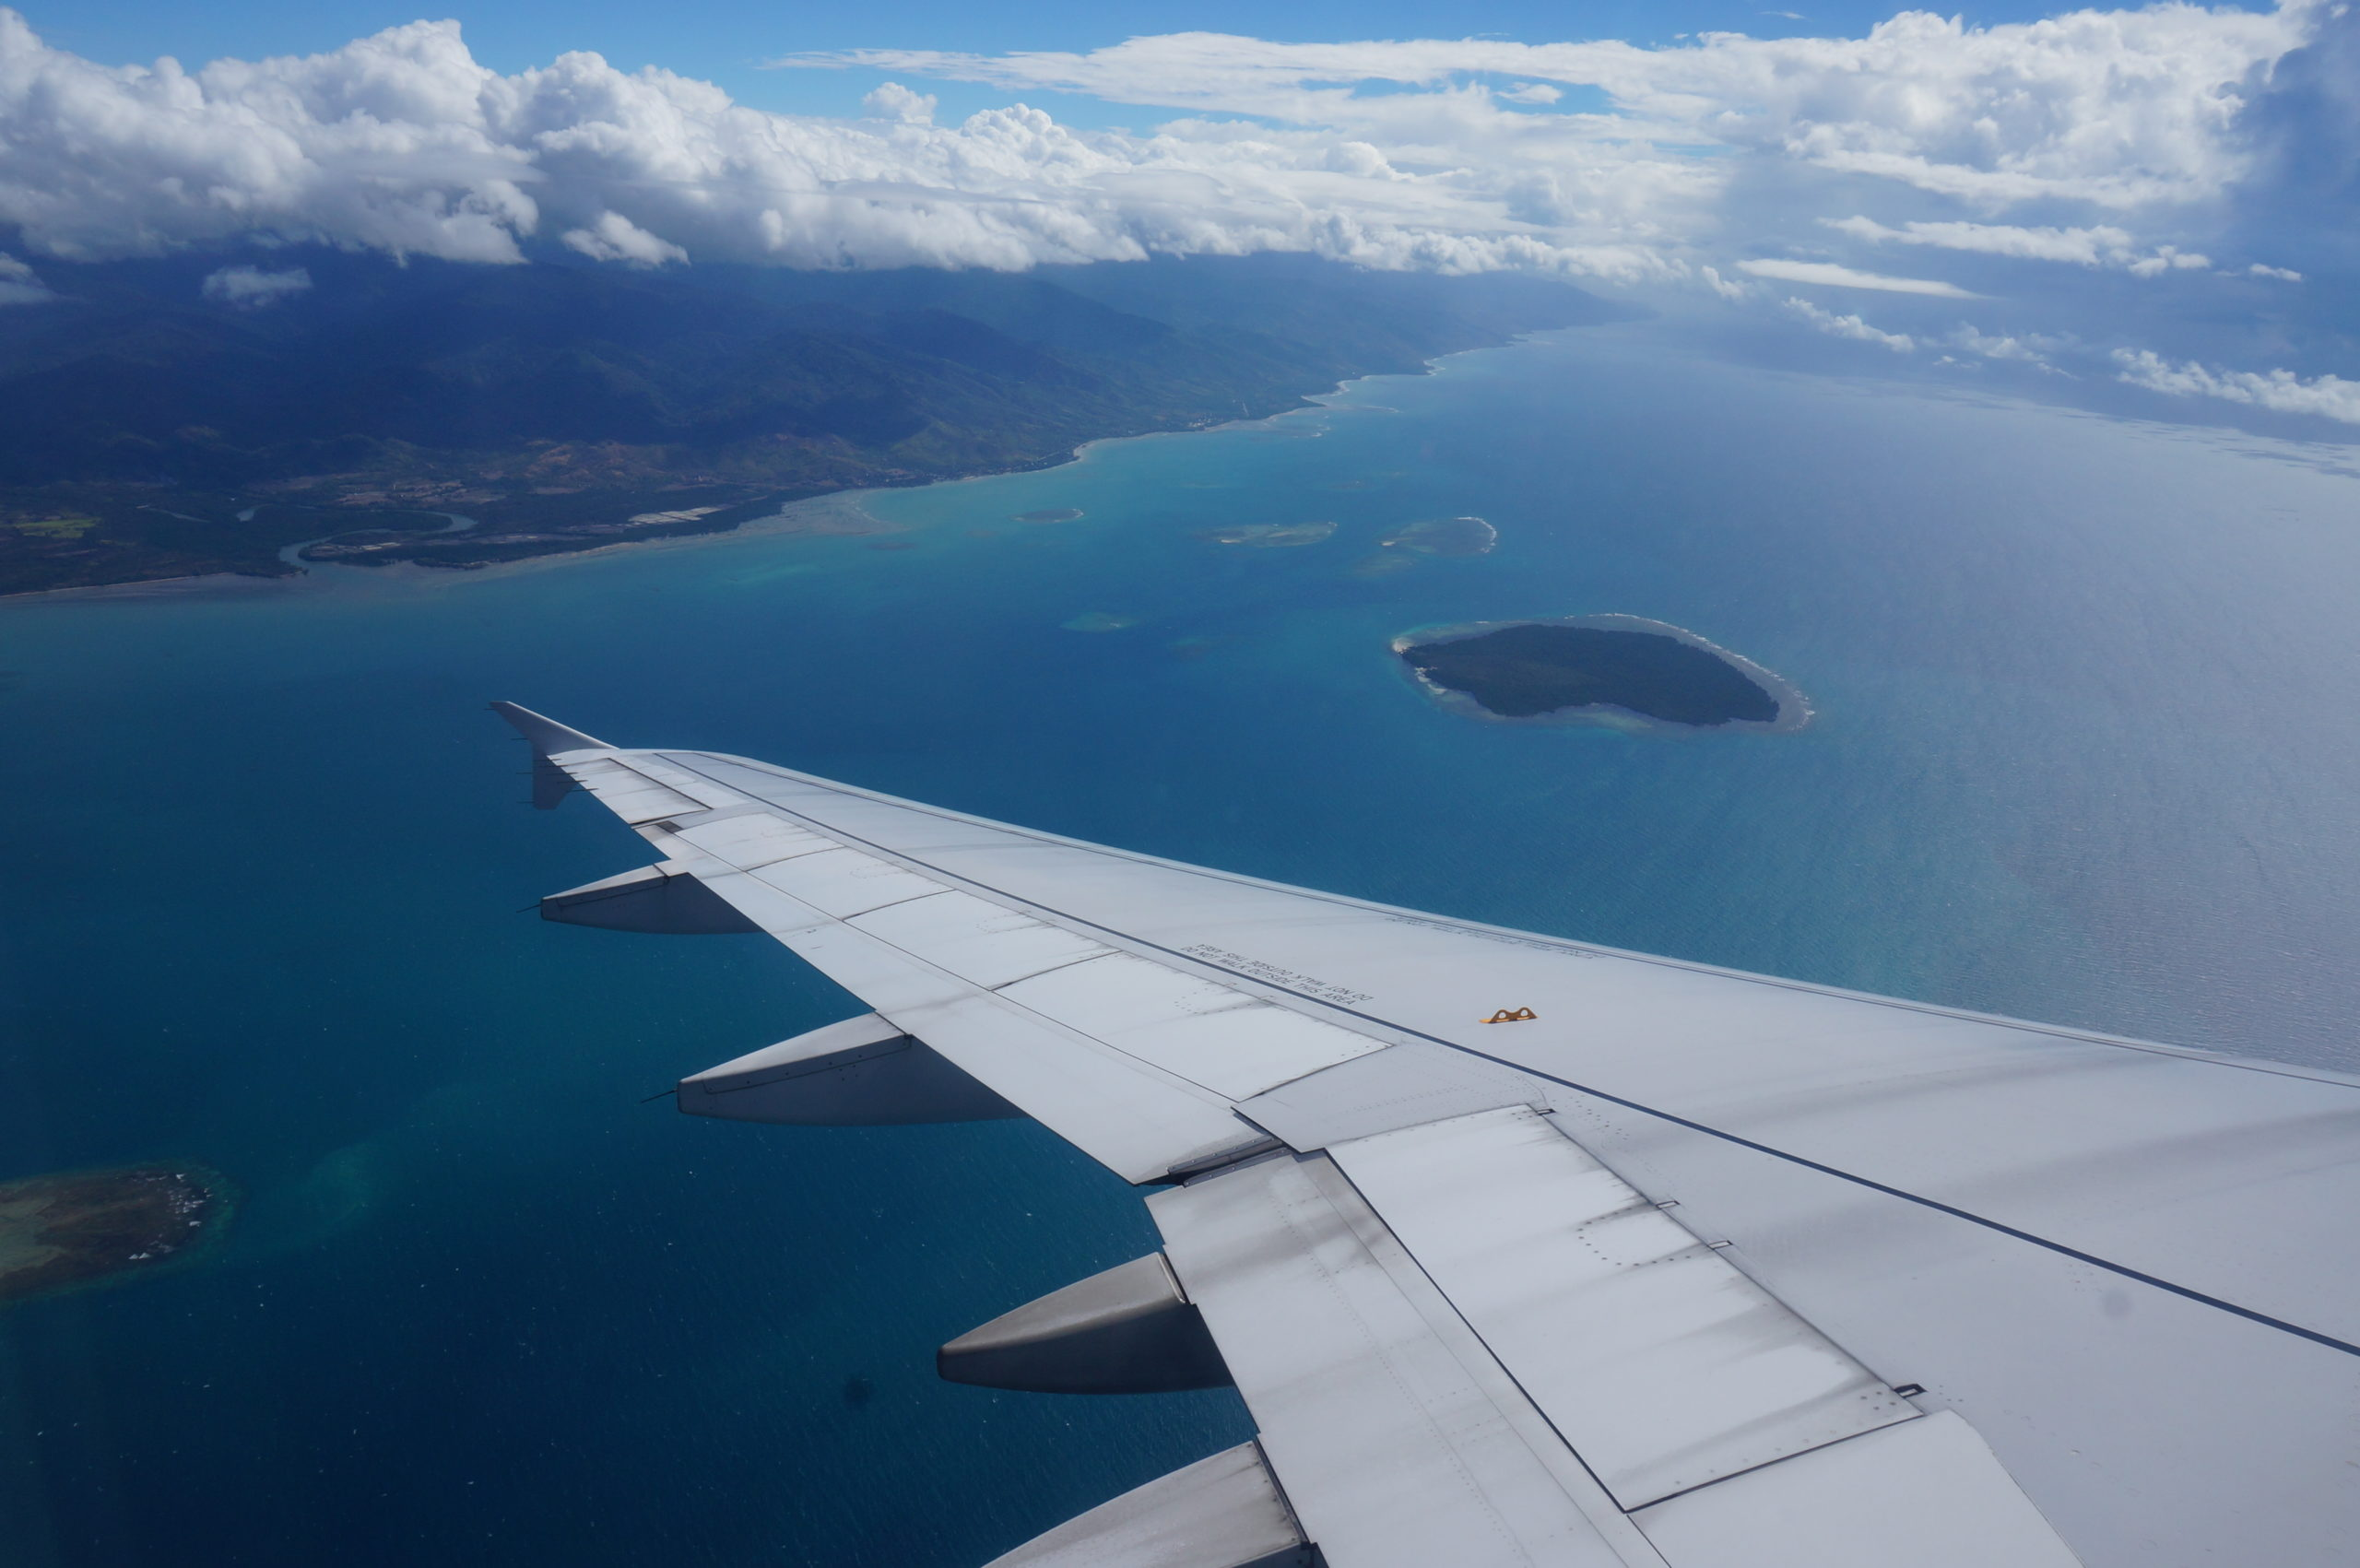 Vue aérienne Palawan - Philippines